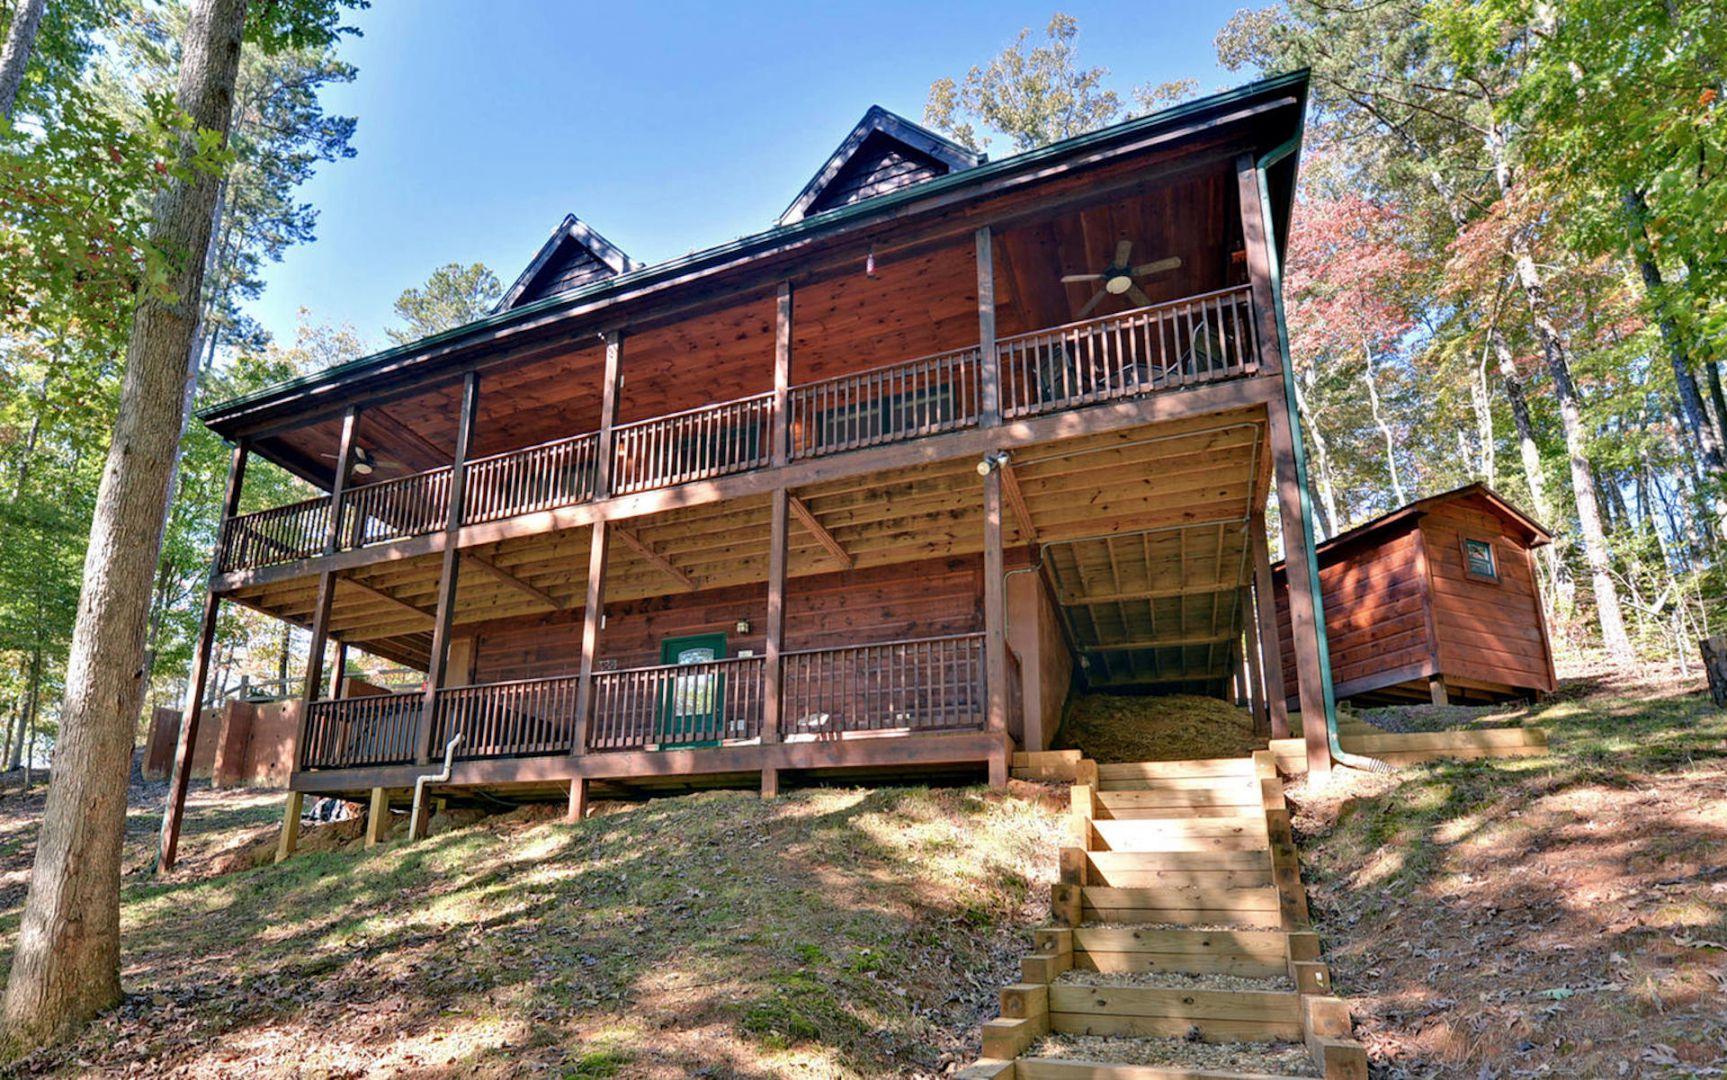 100 Acre Wood Rental Cabin